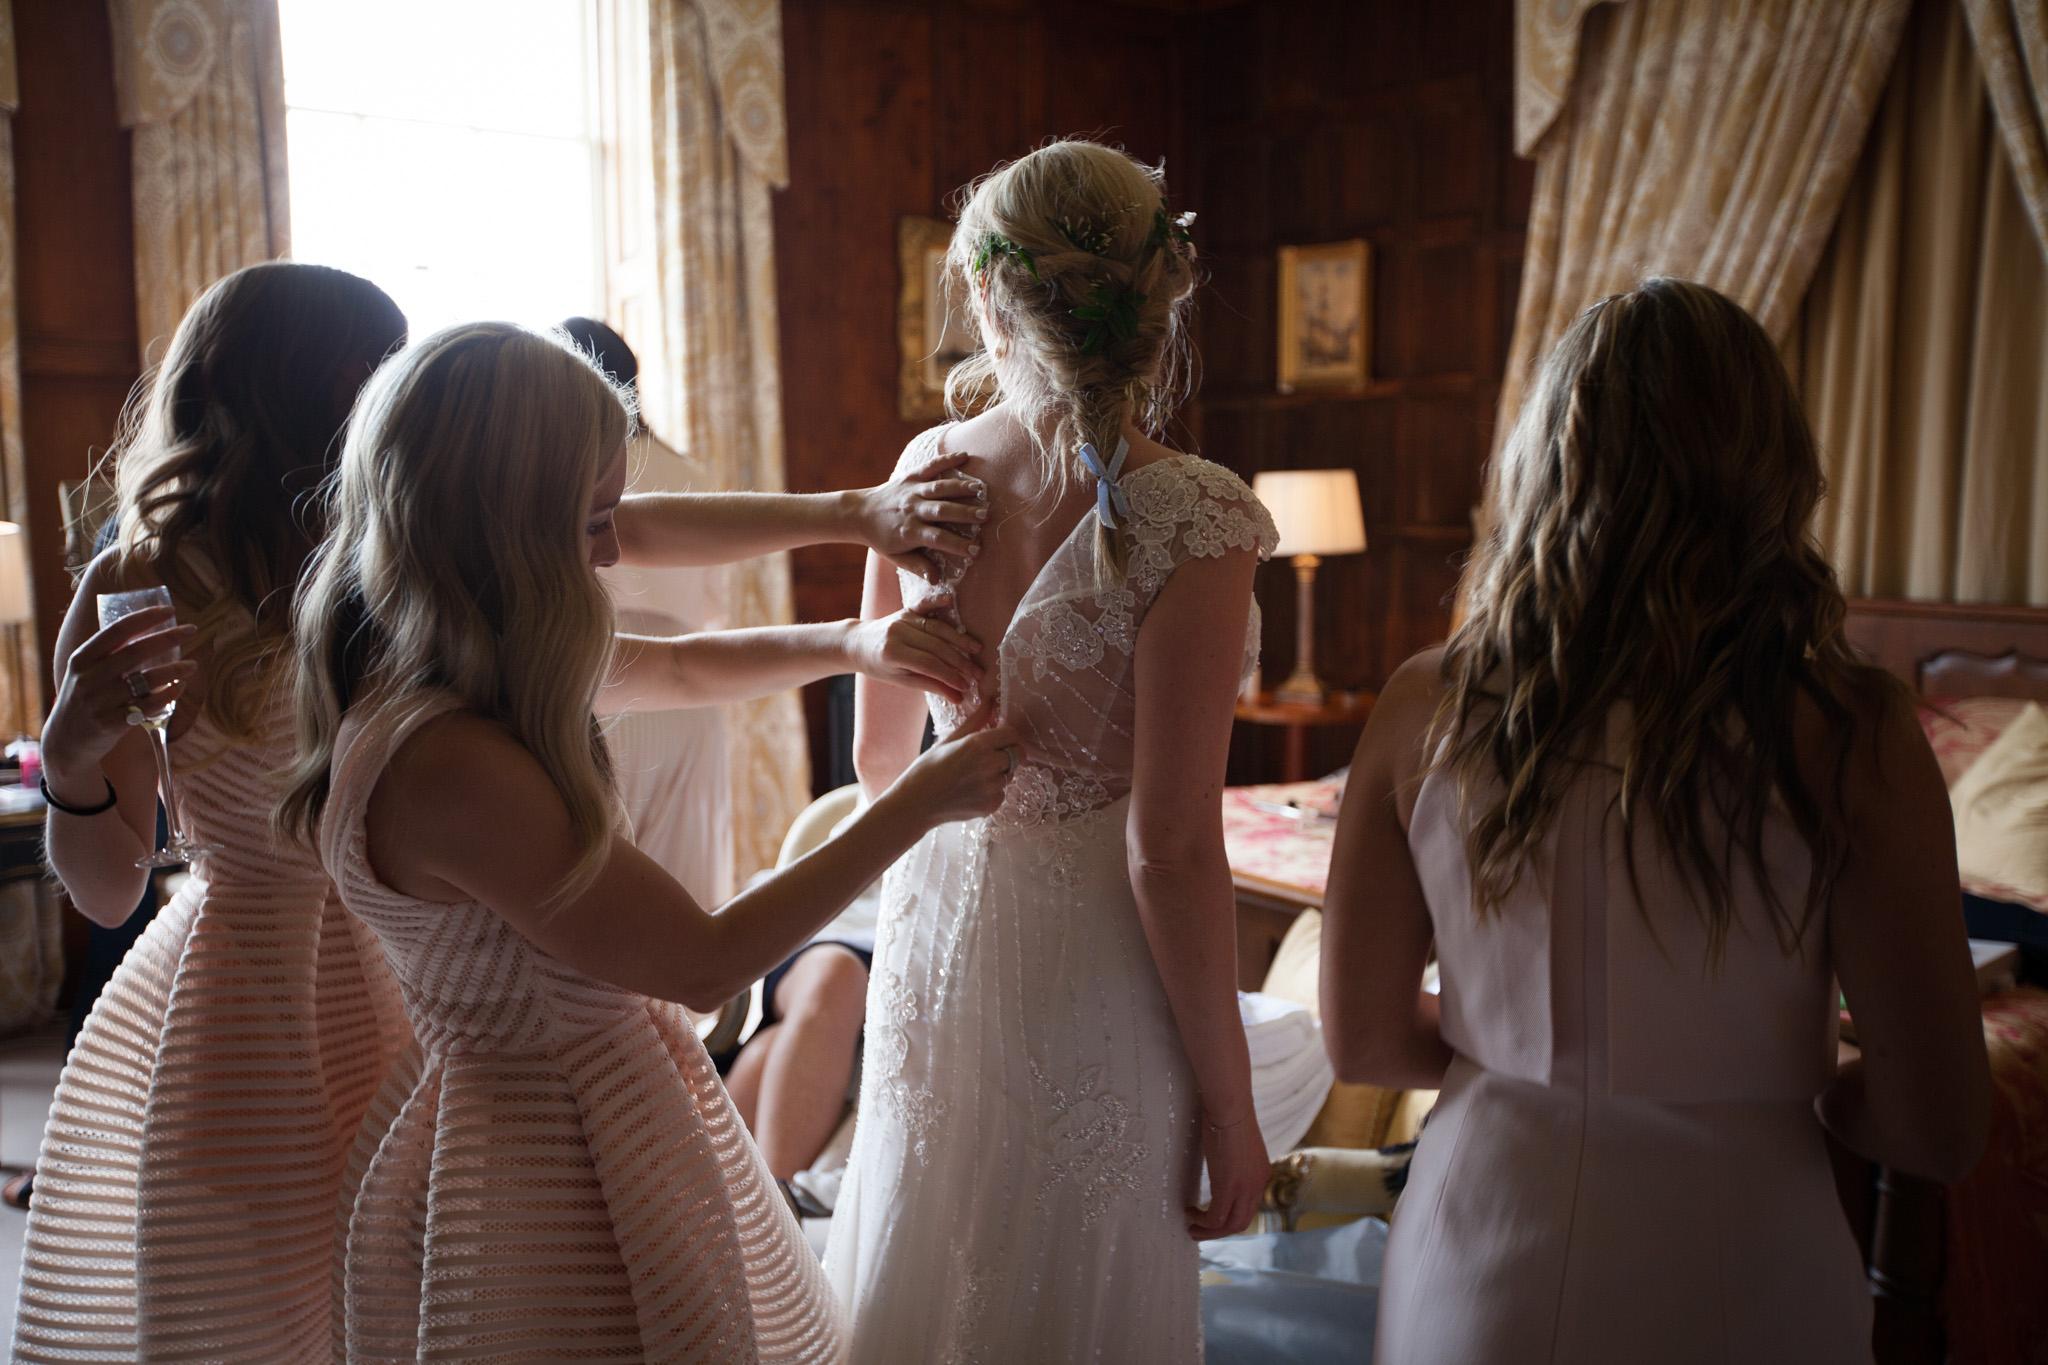 Mark_Barnes_Gloucester_Wedding_Photographer_Elmore_Court_Wedding_Photography_Mike+Kelly-18.jpg